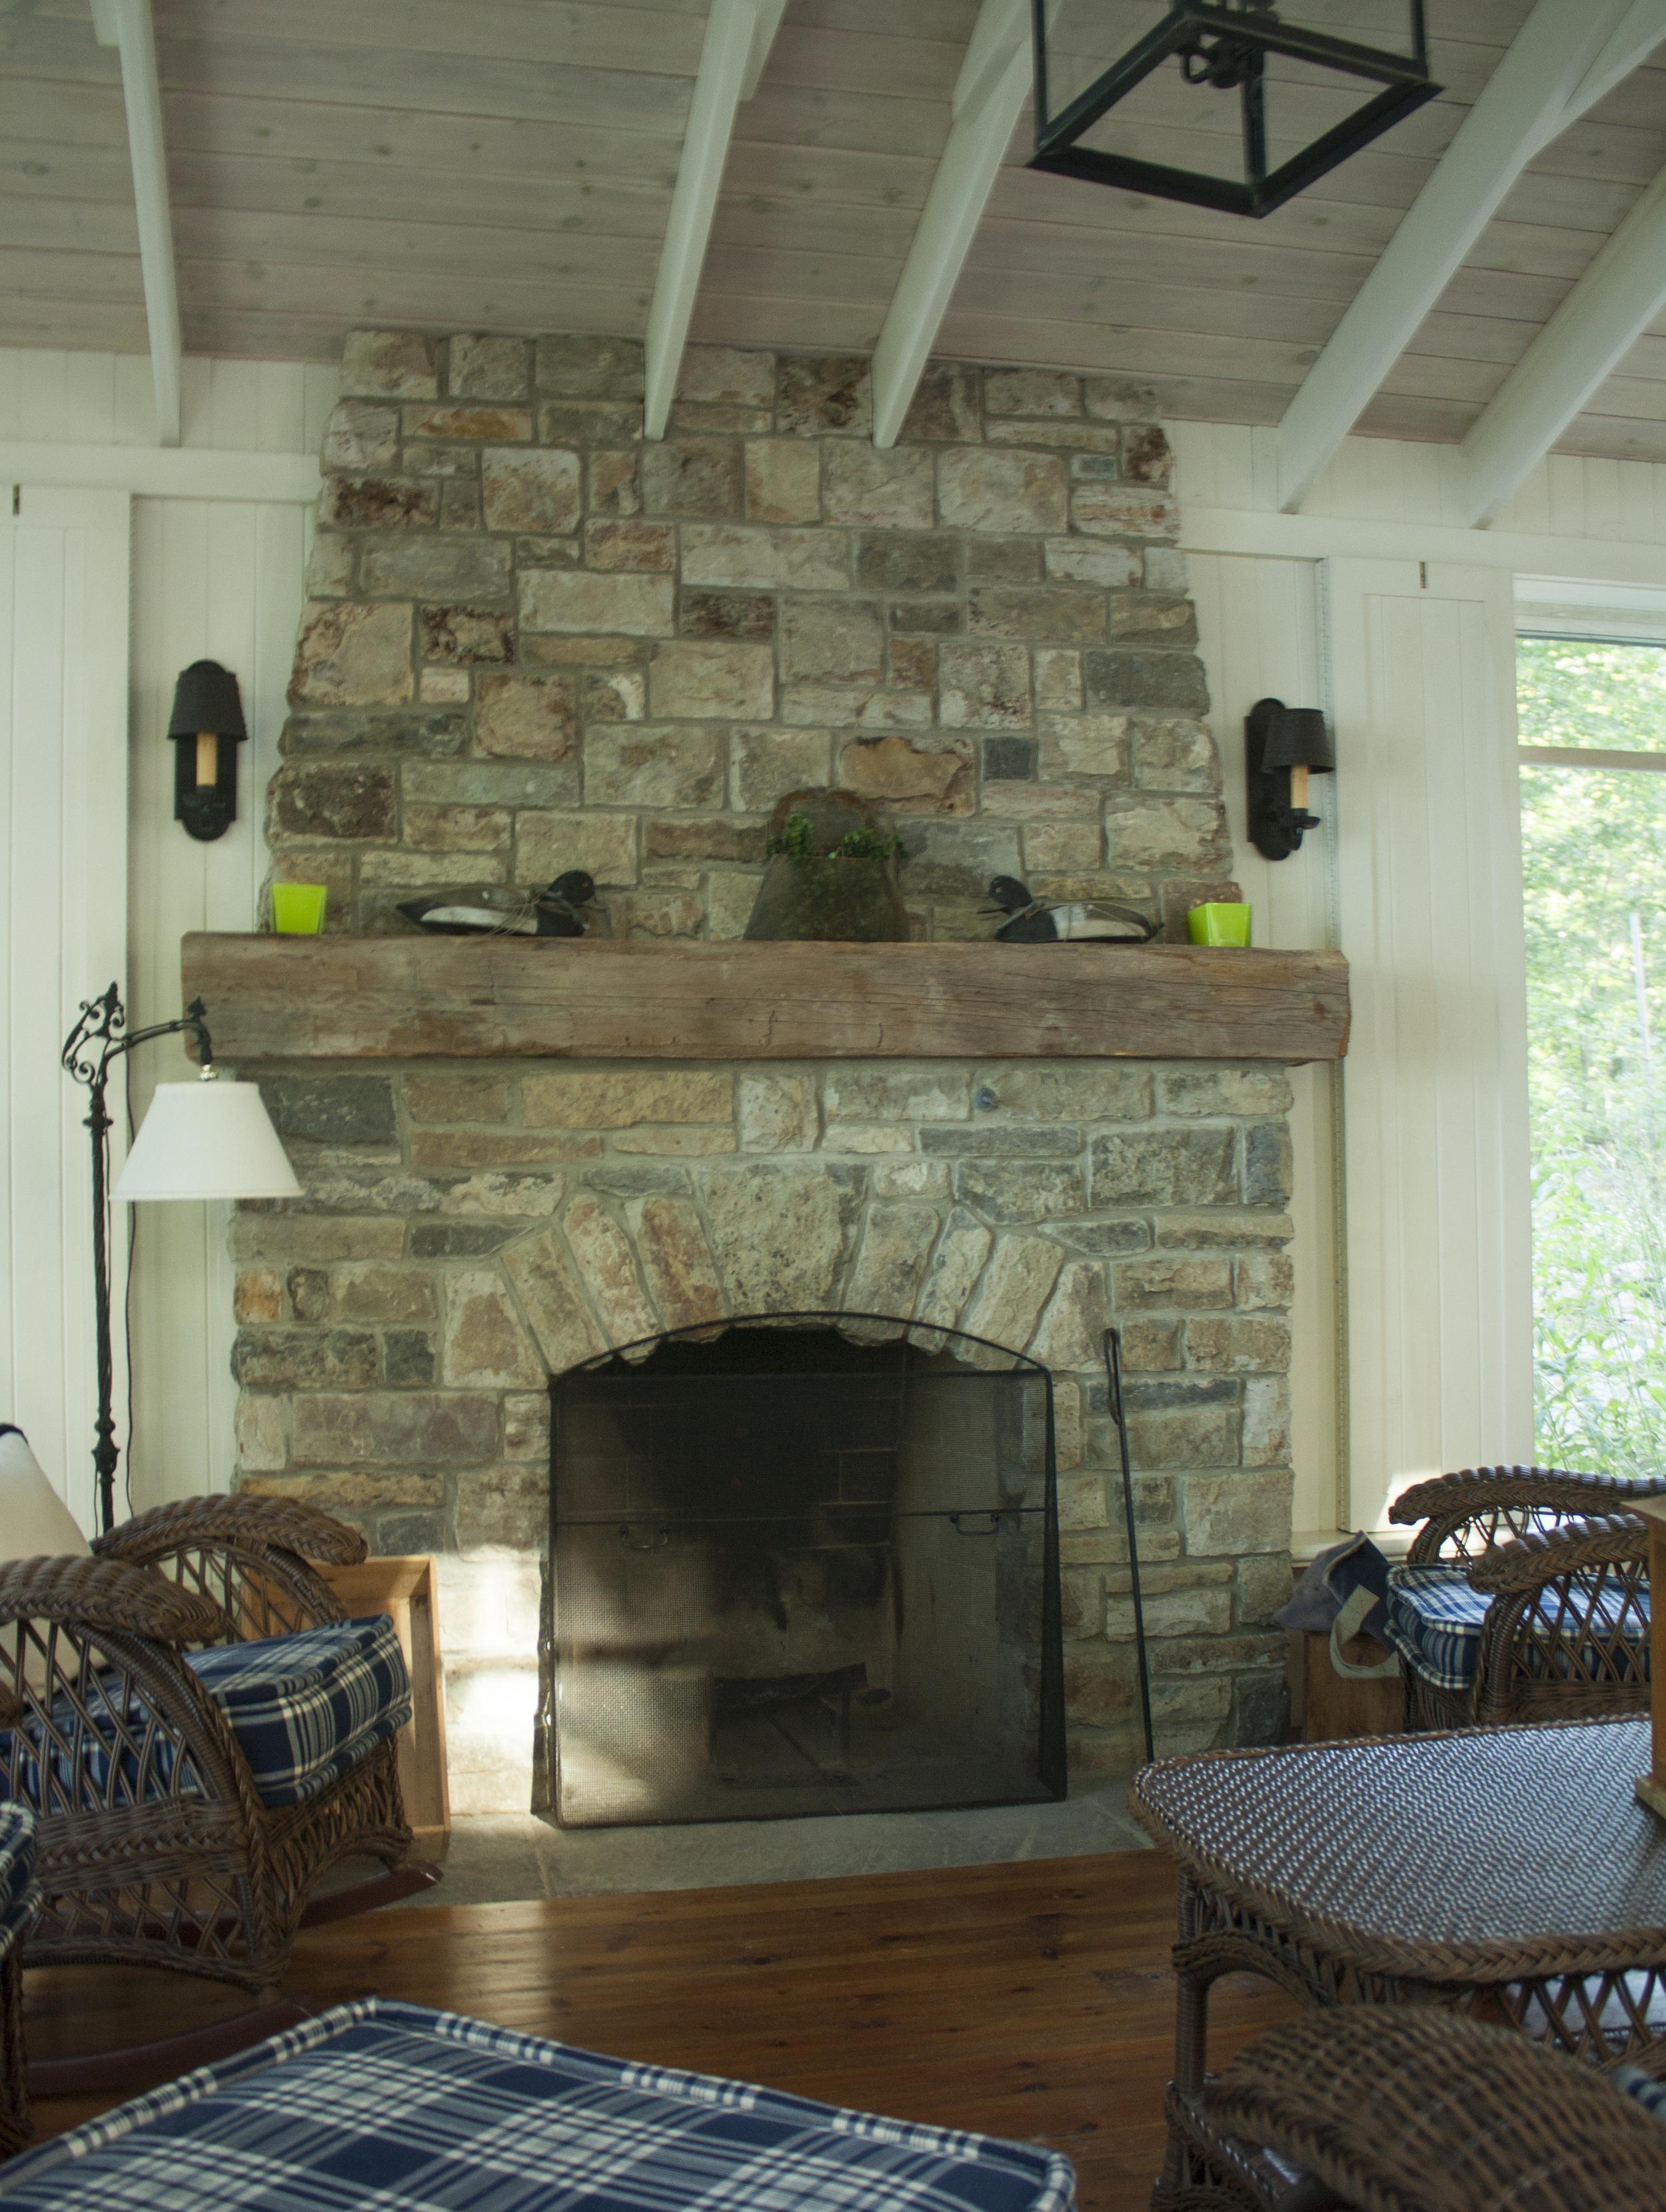 Thousand Islands Cottage | Interior Element Design | Brockville | Riverview Design Solutions | Prescott, Ontario, Canada